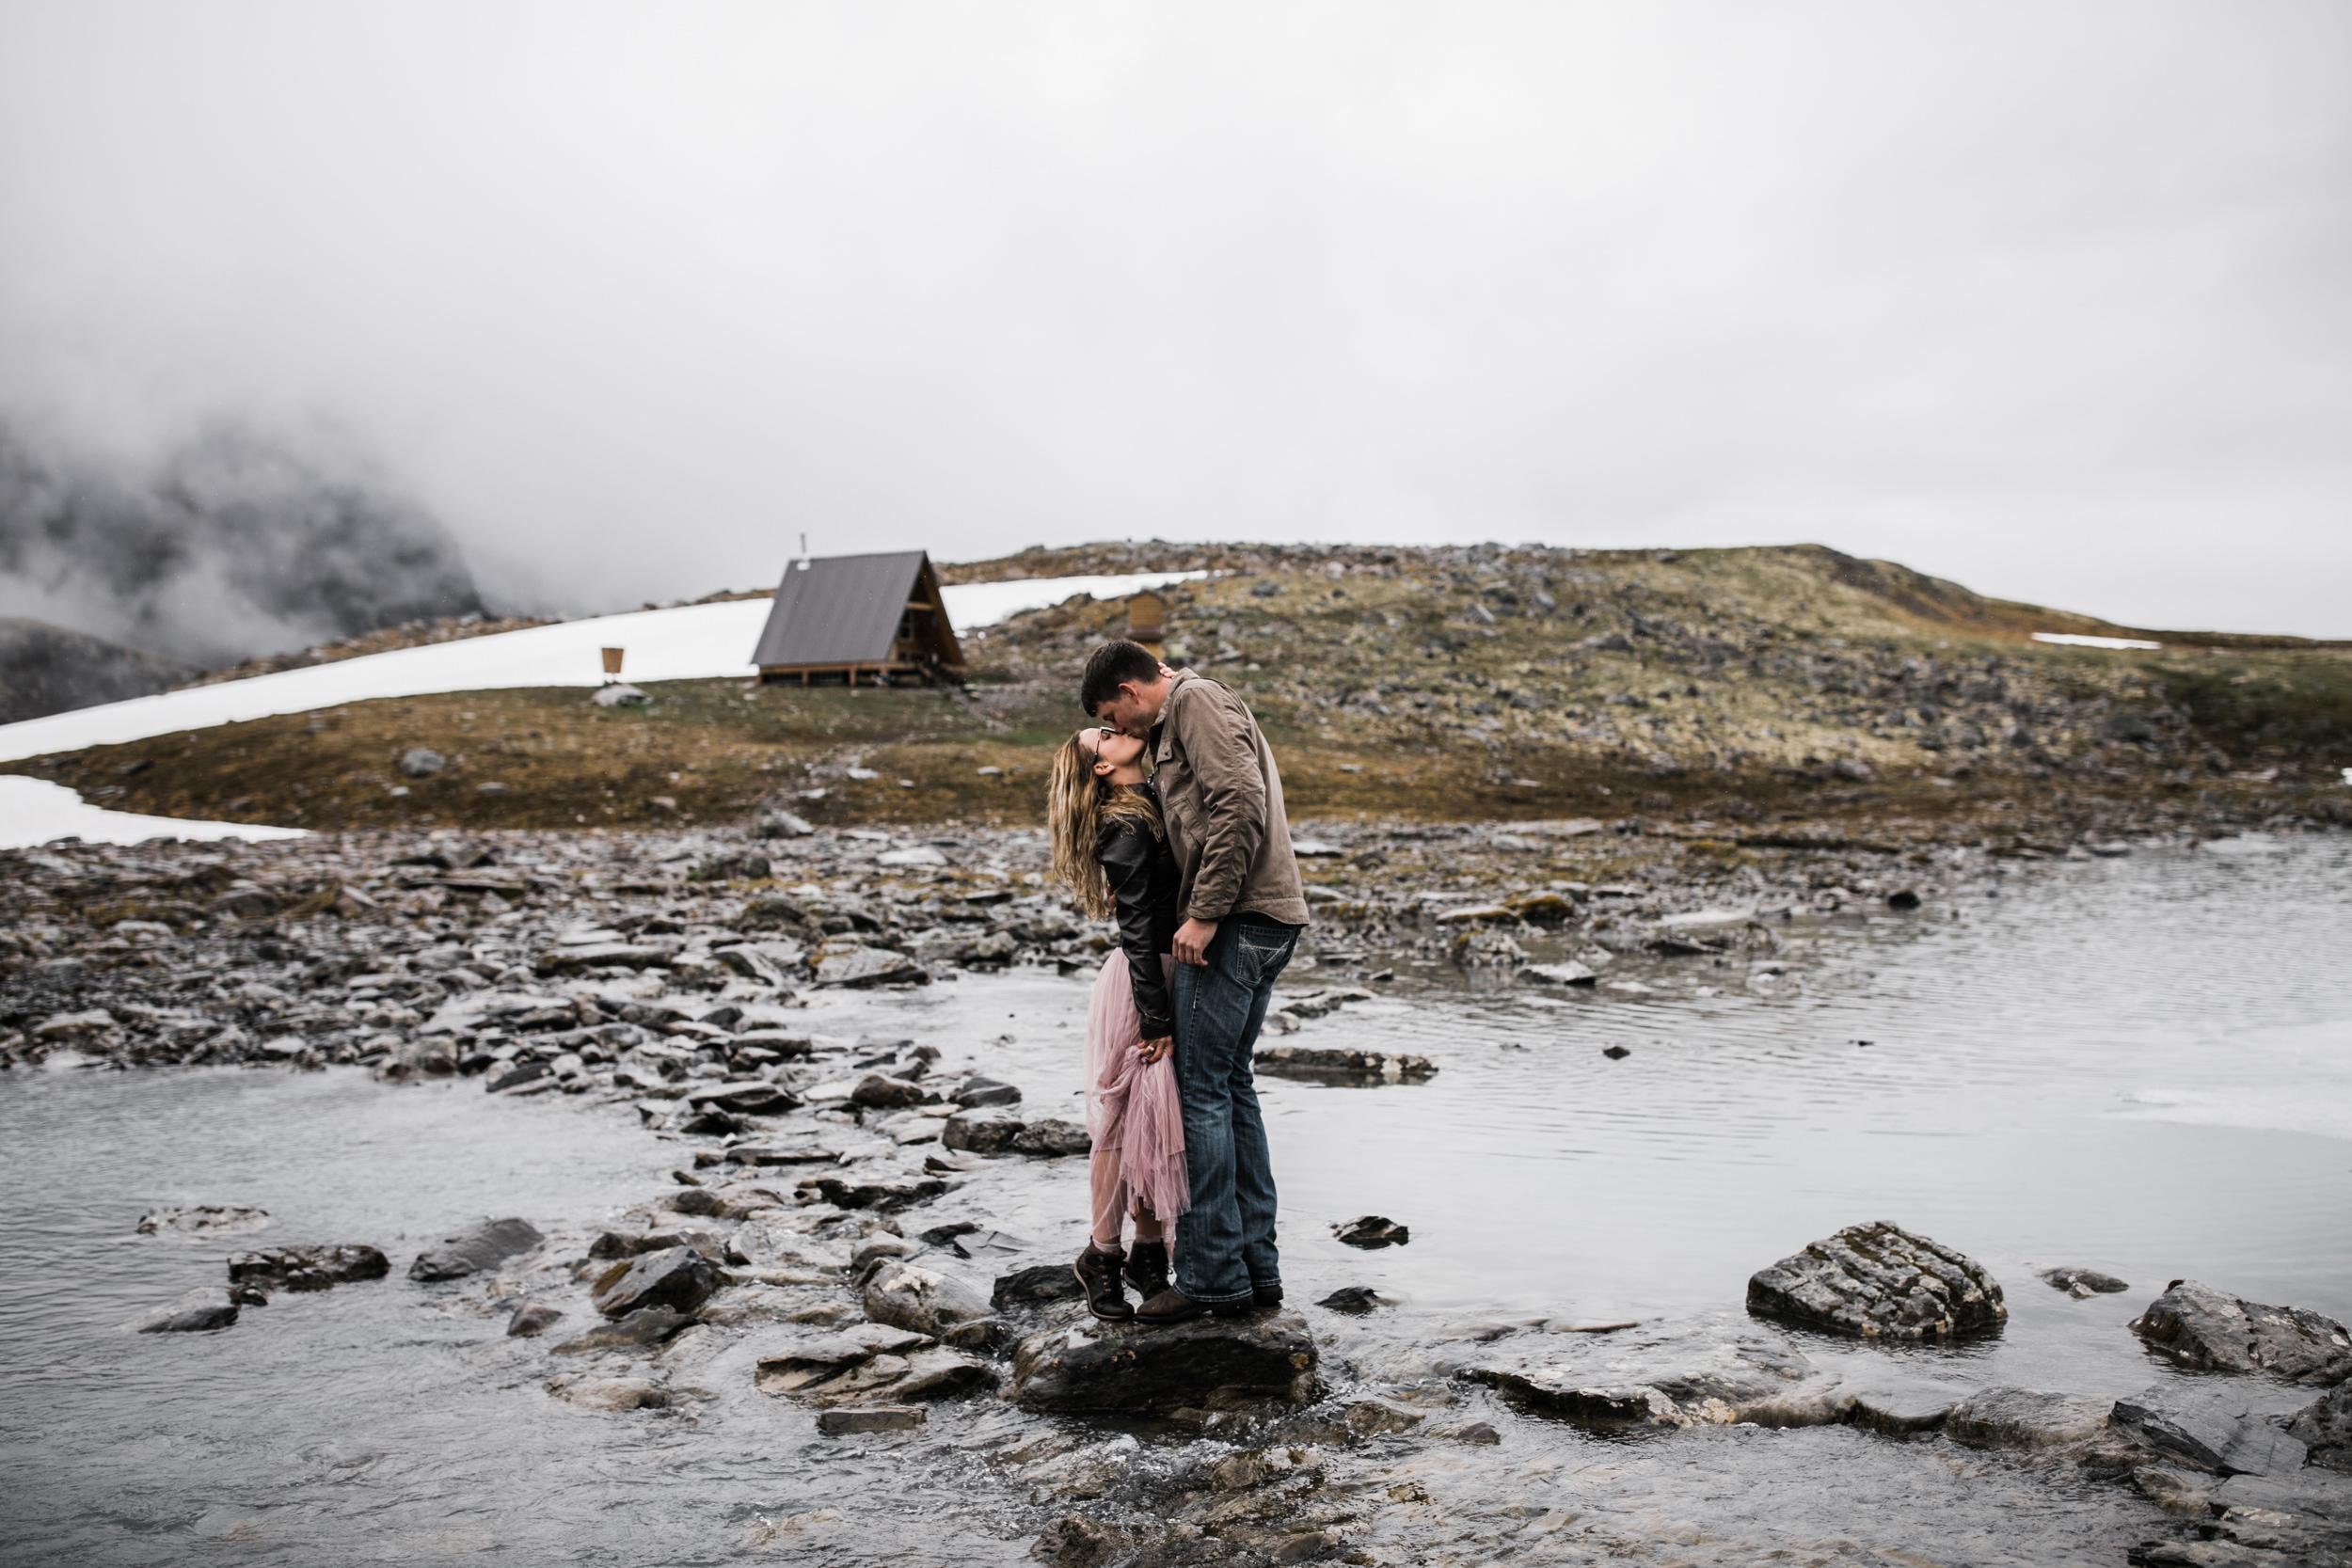 adventure engagement session in alaska | alyeska, girdwood elopement photographer | alaska destination wedding photographer | the hearnes adventure photography